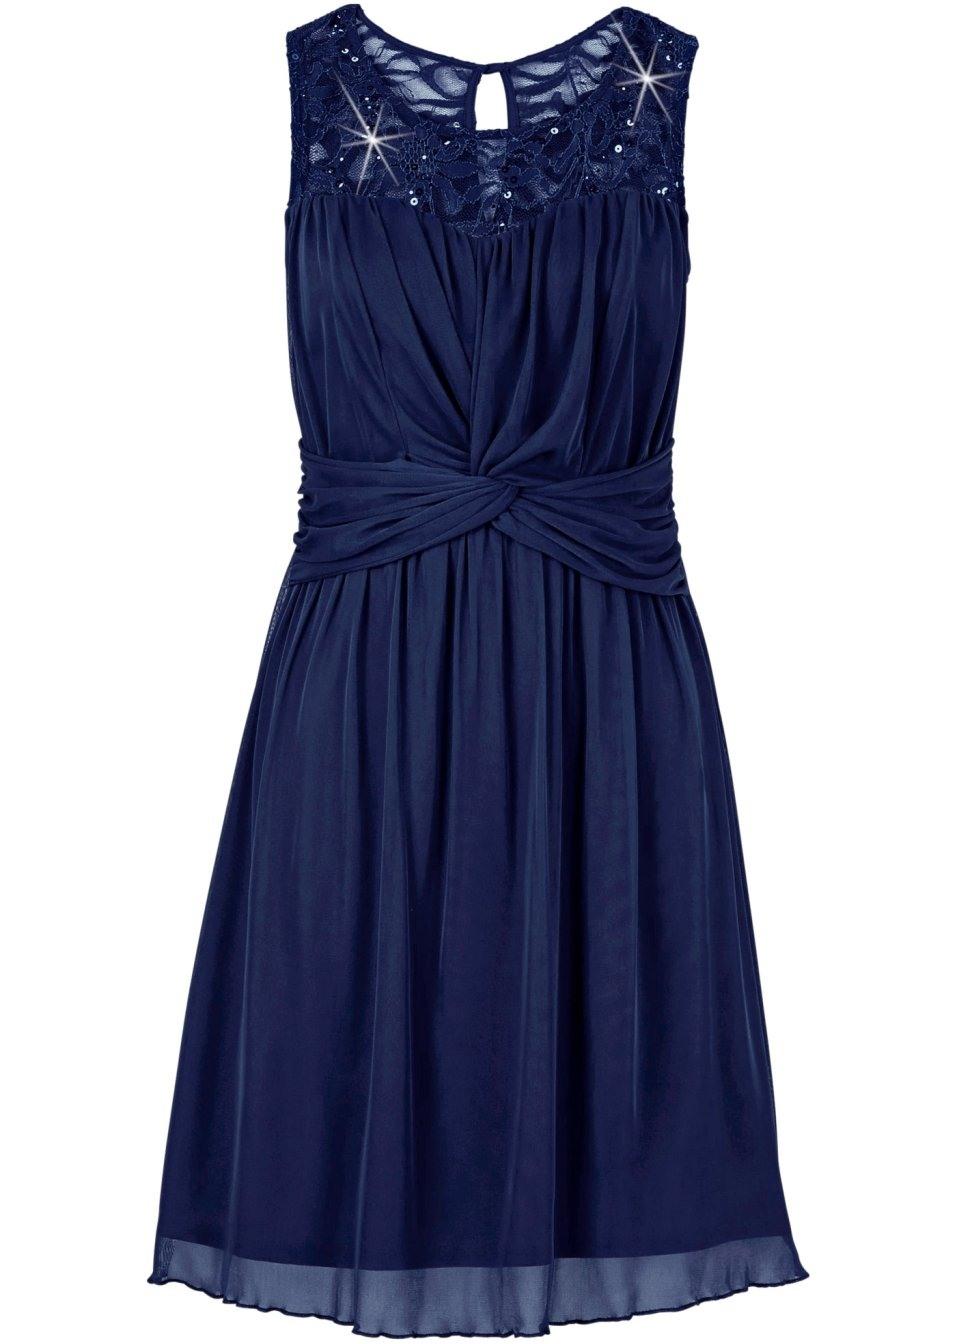 Abend Perfekt Spitzenkleid Blau Langarm DesignDesigner Einfach Spitzenkleid Blau Langarm Design